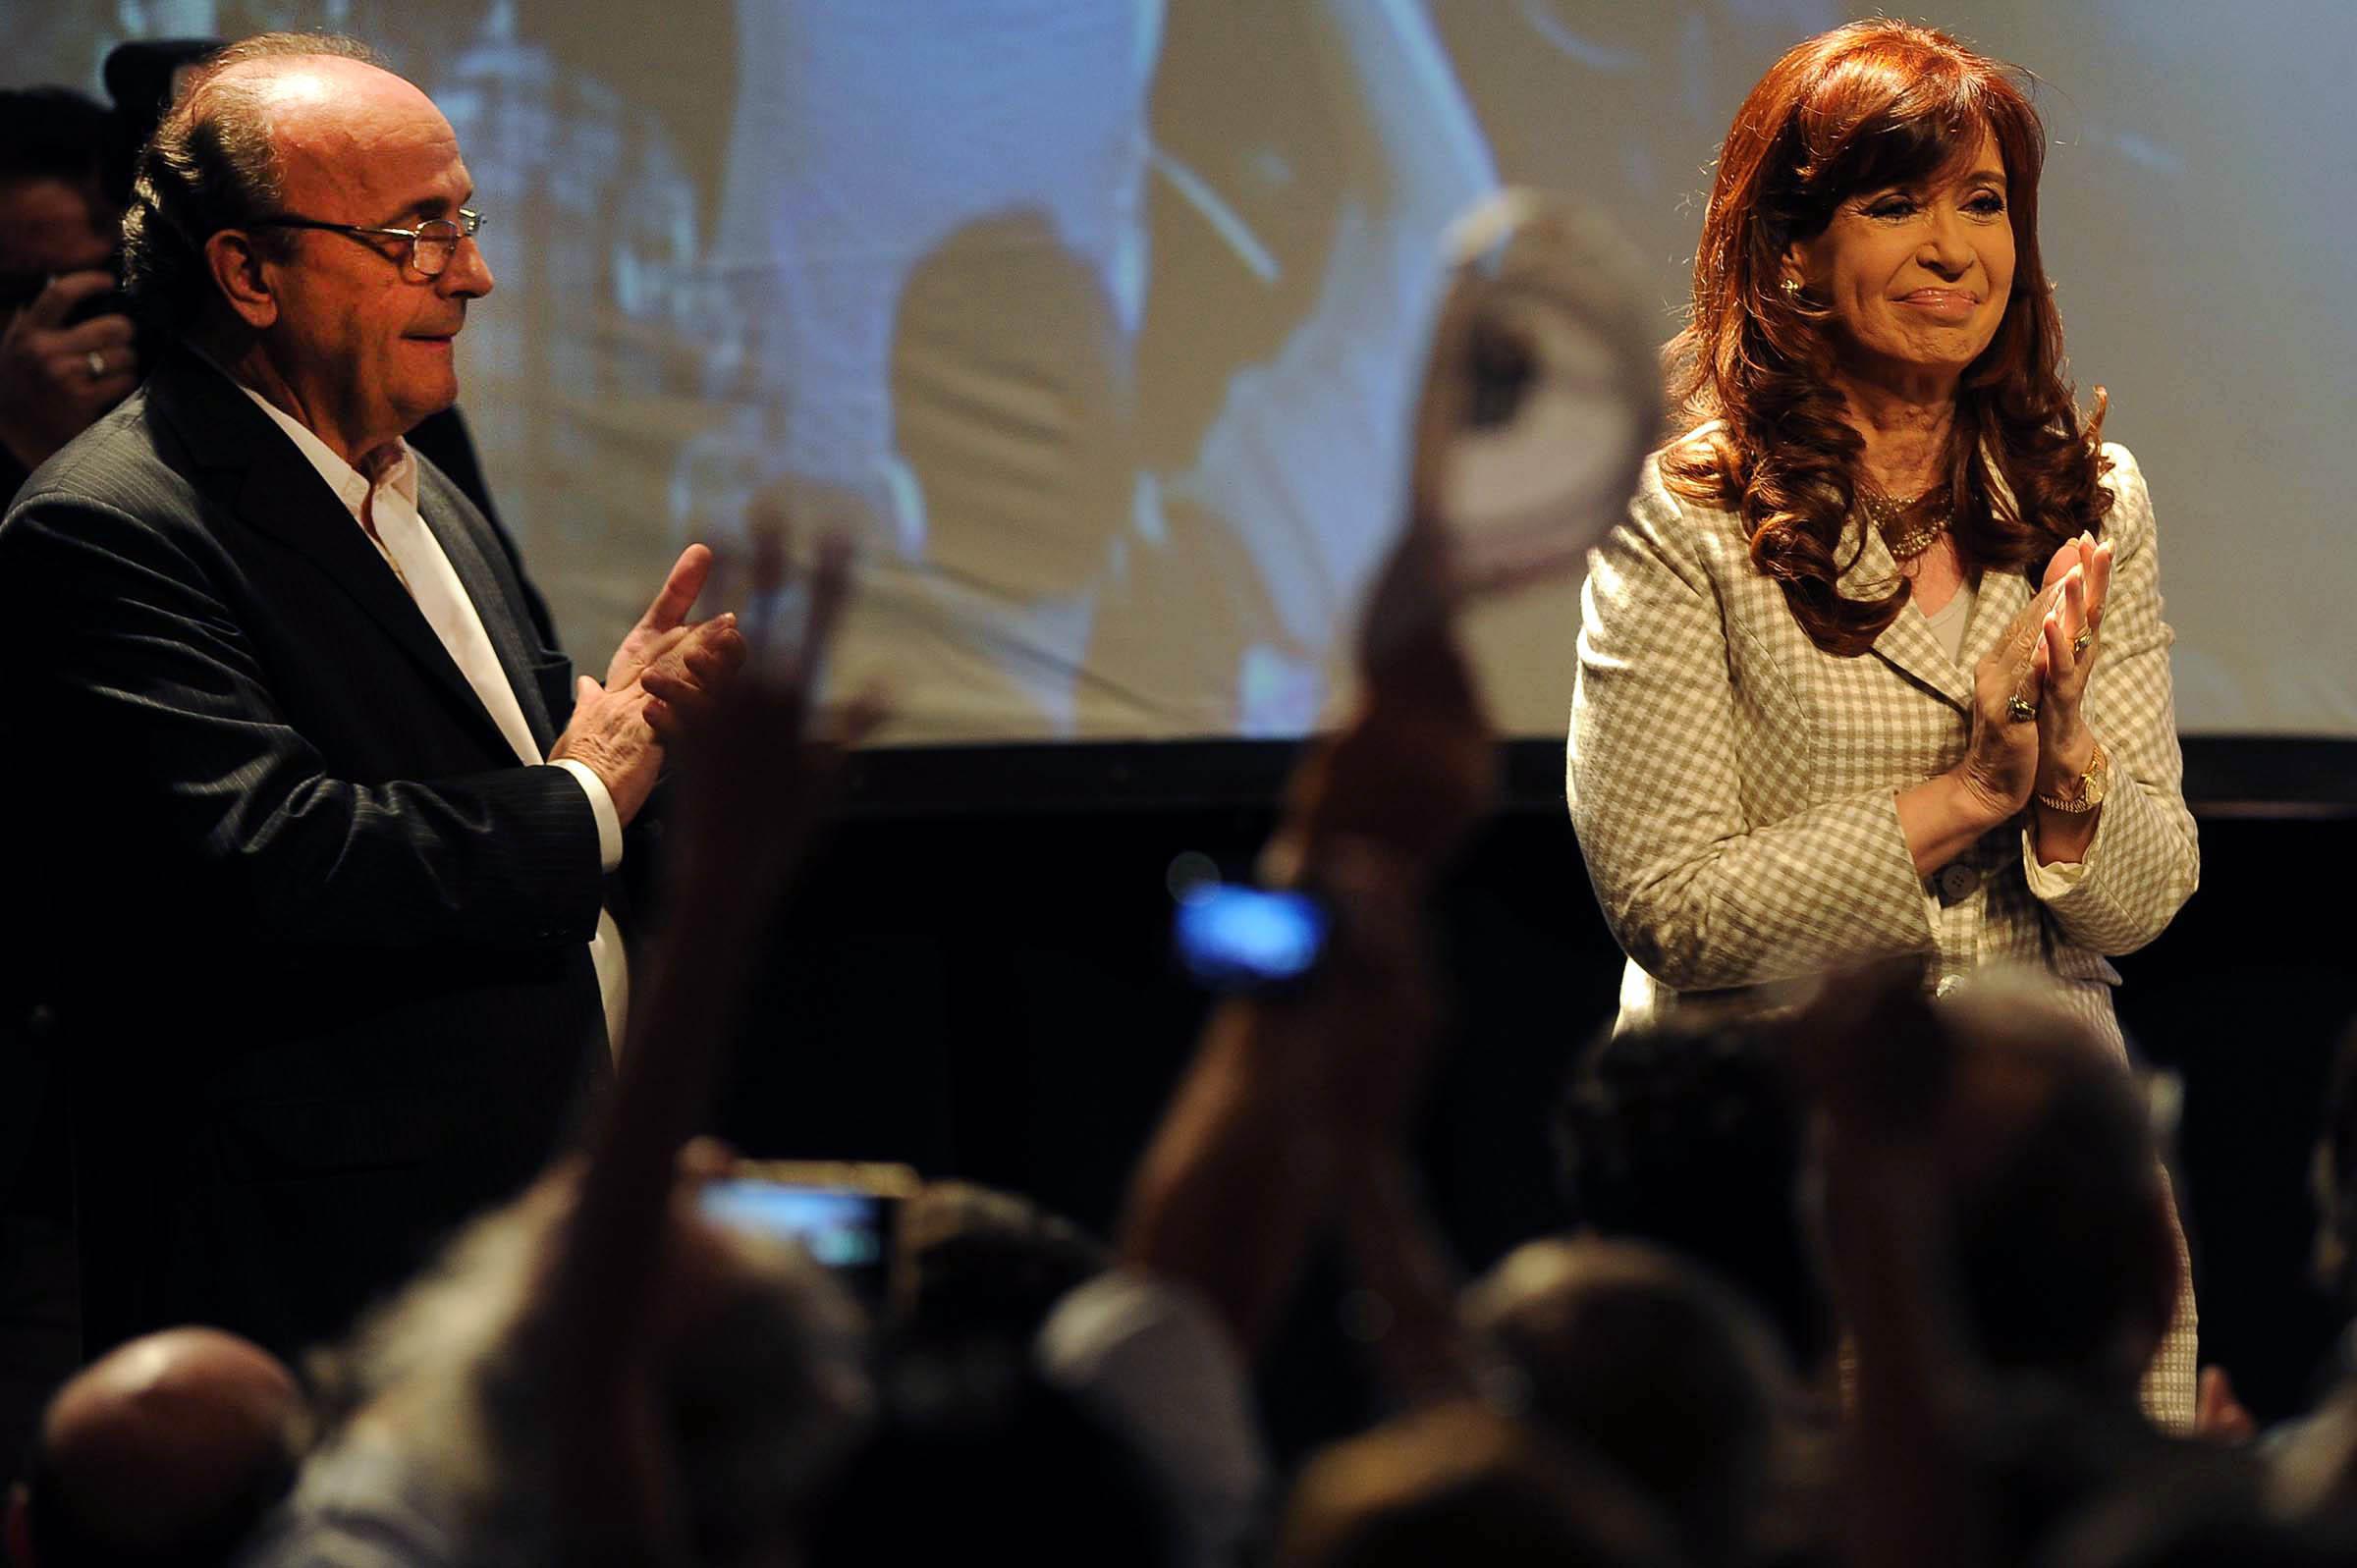 17-04-2015_buenos_aires_la_presidenta_cristina (7)